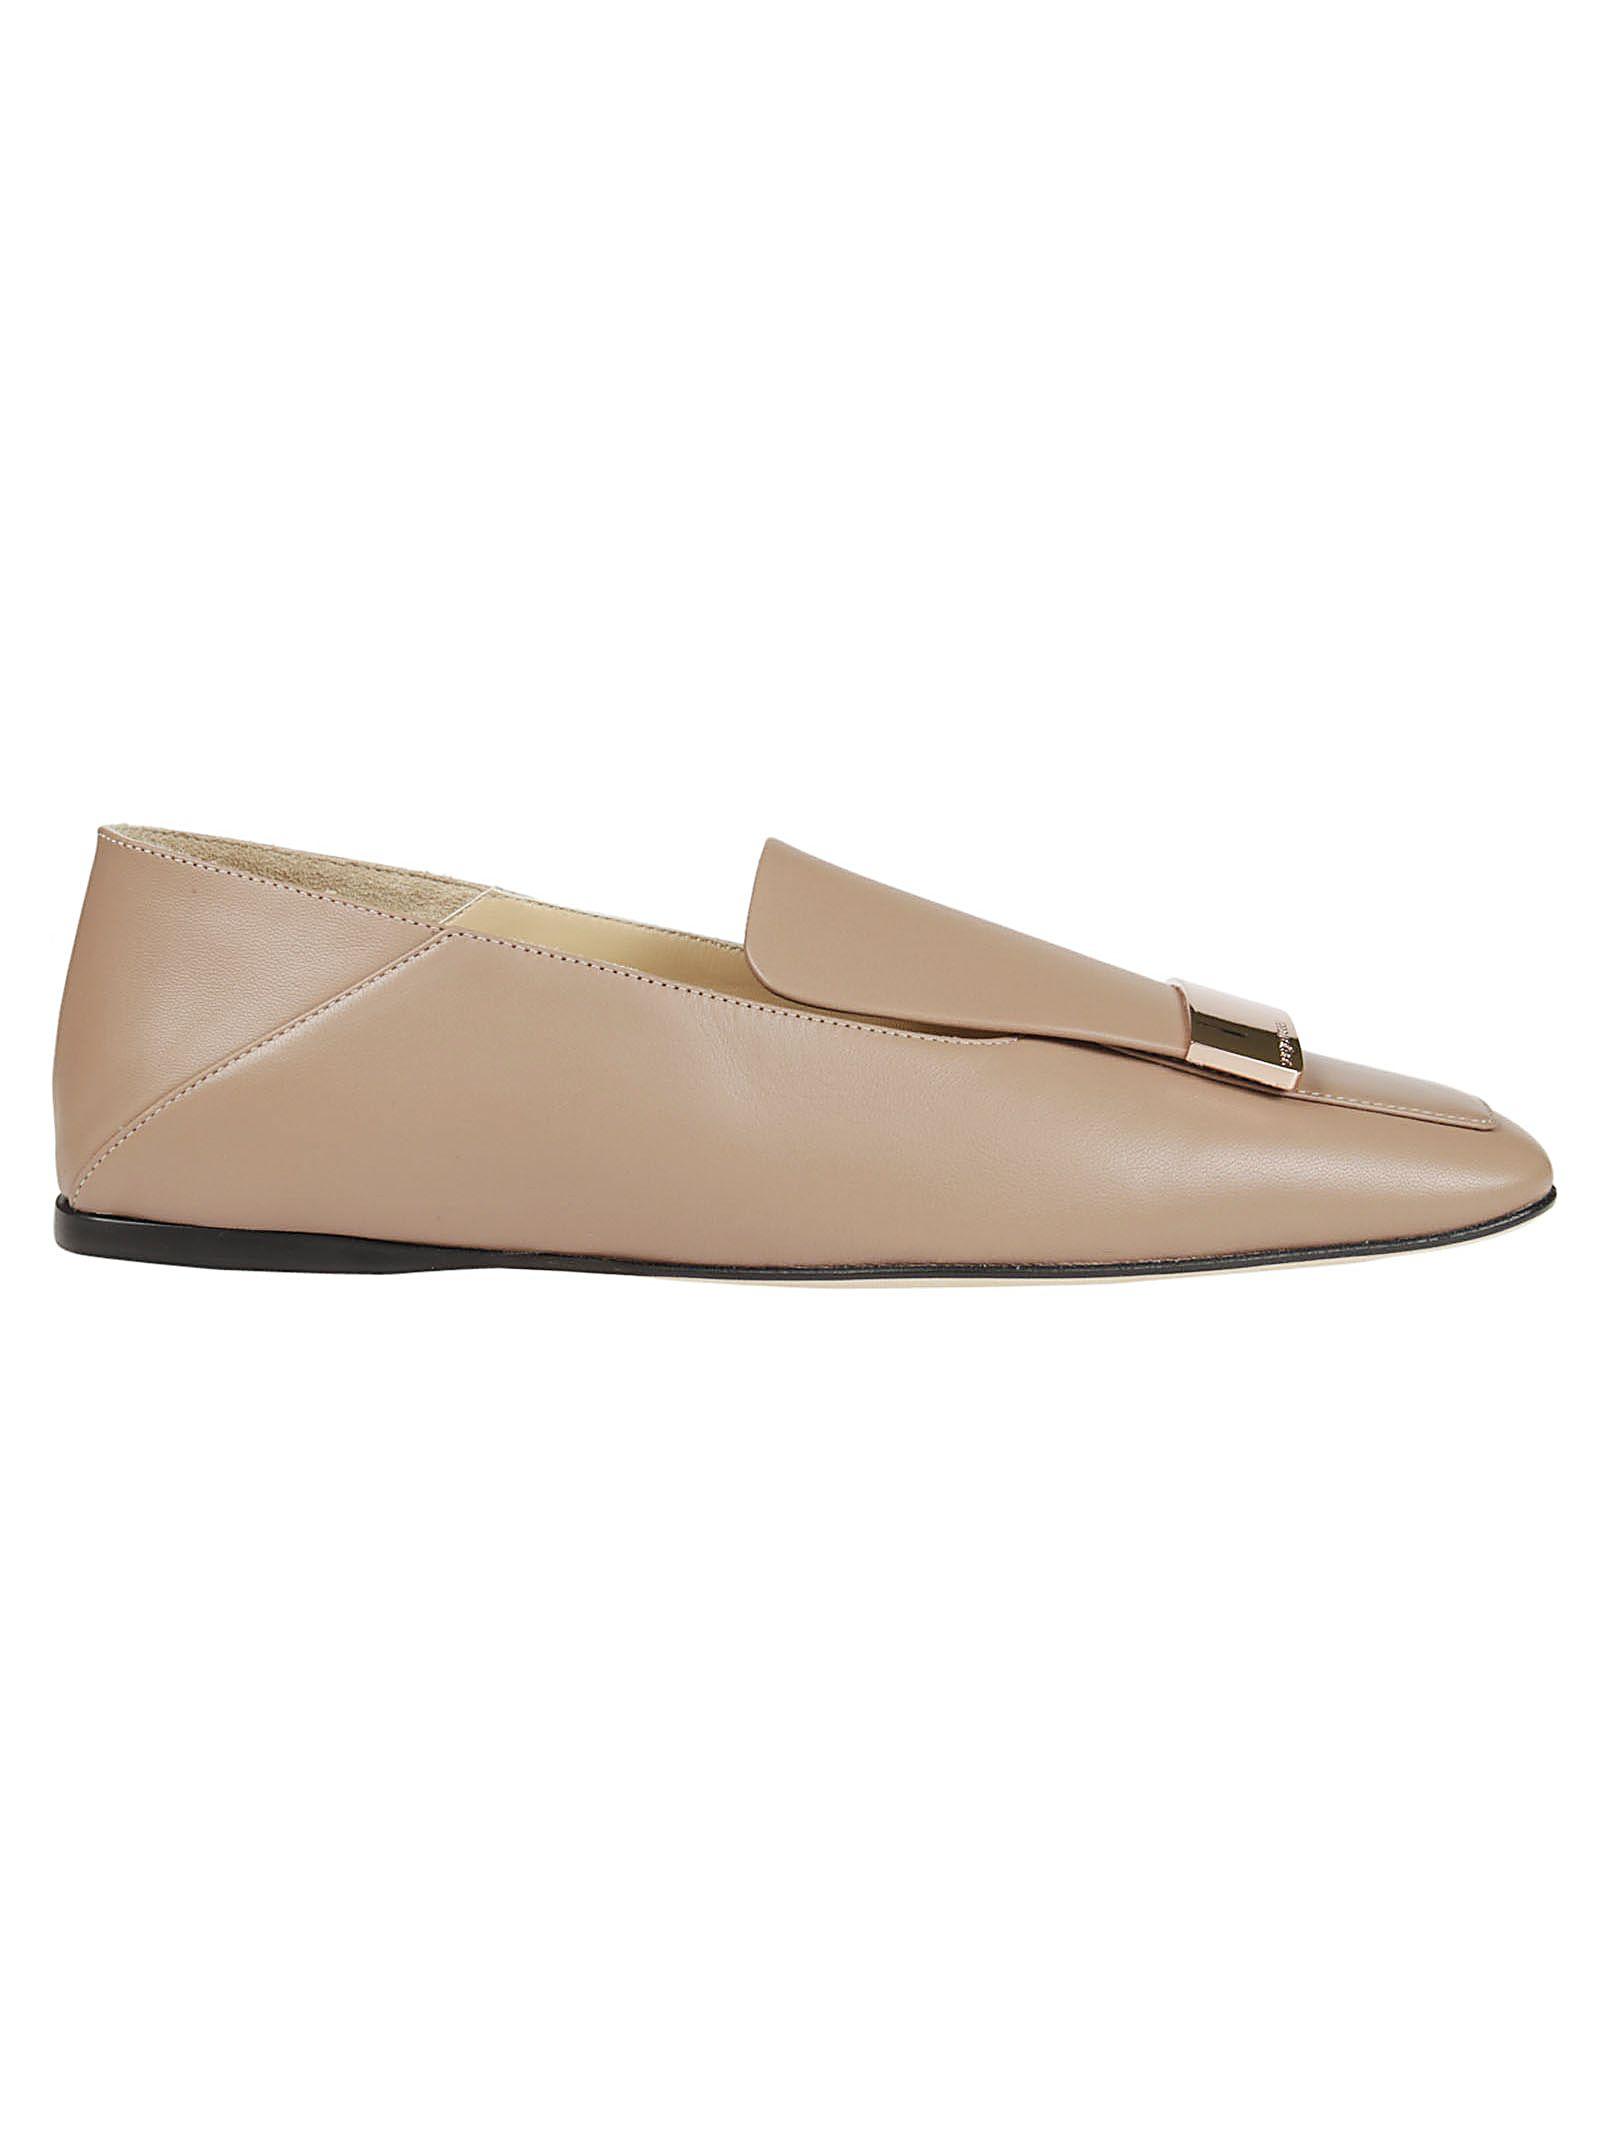 Sergio Rossi square toe ballerina shoes buy cheap low price teqbh